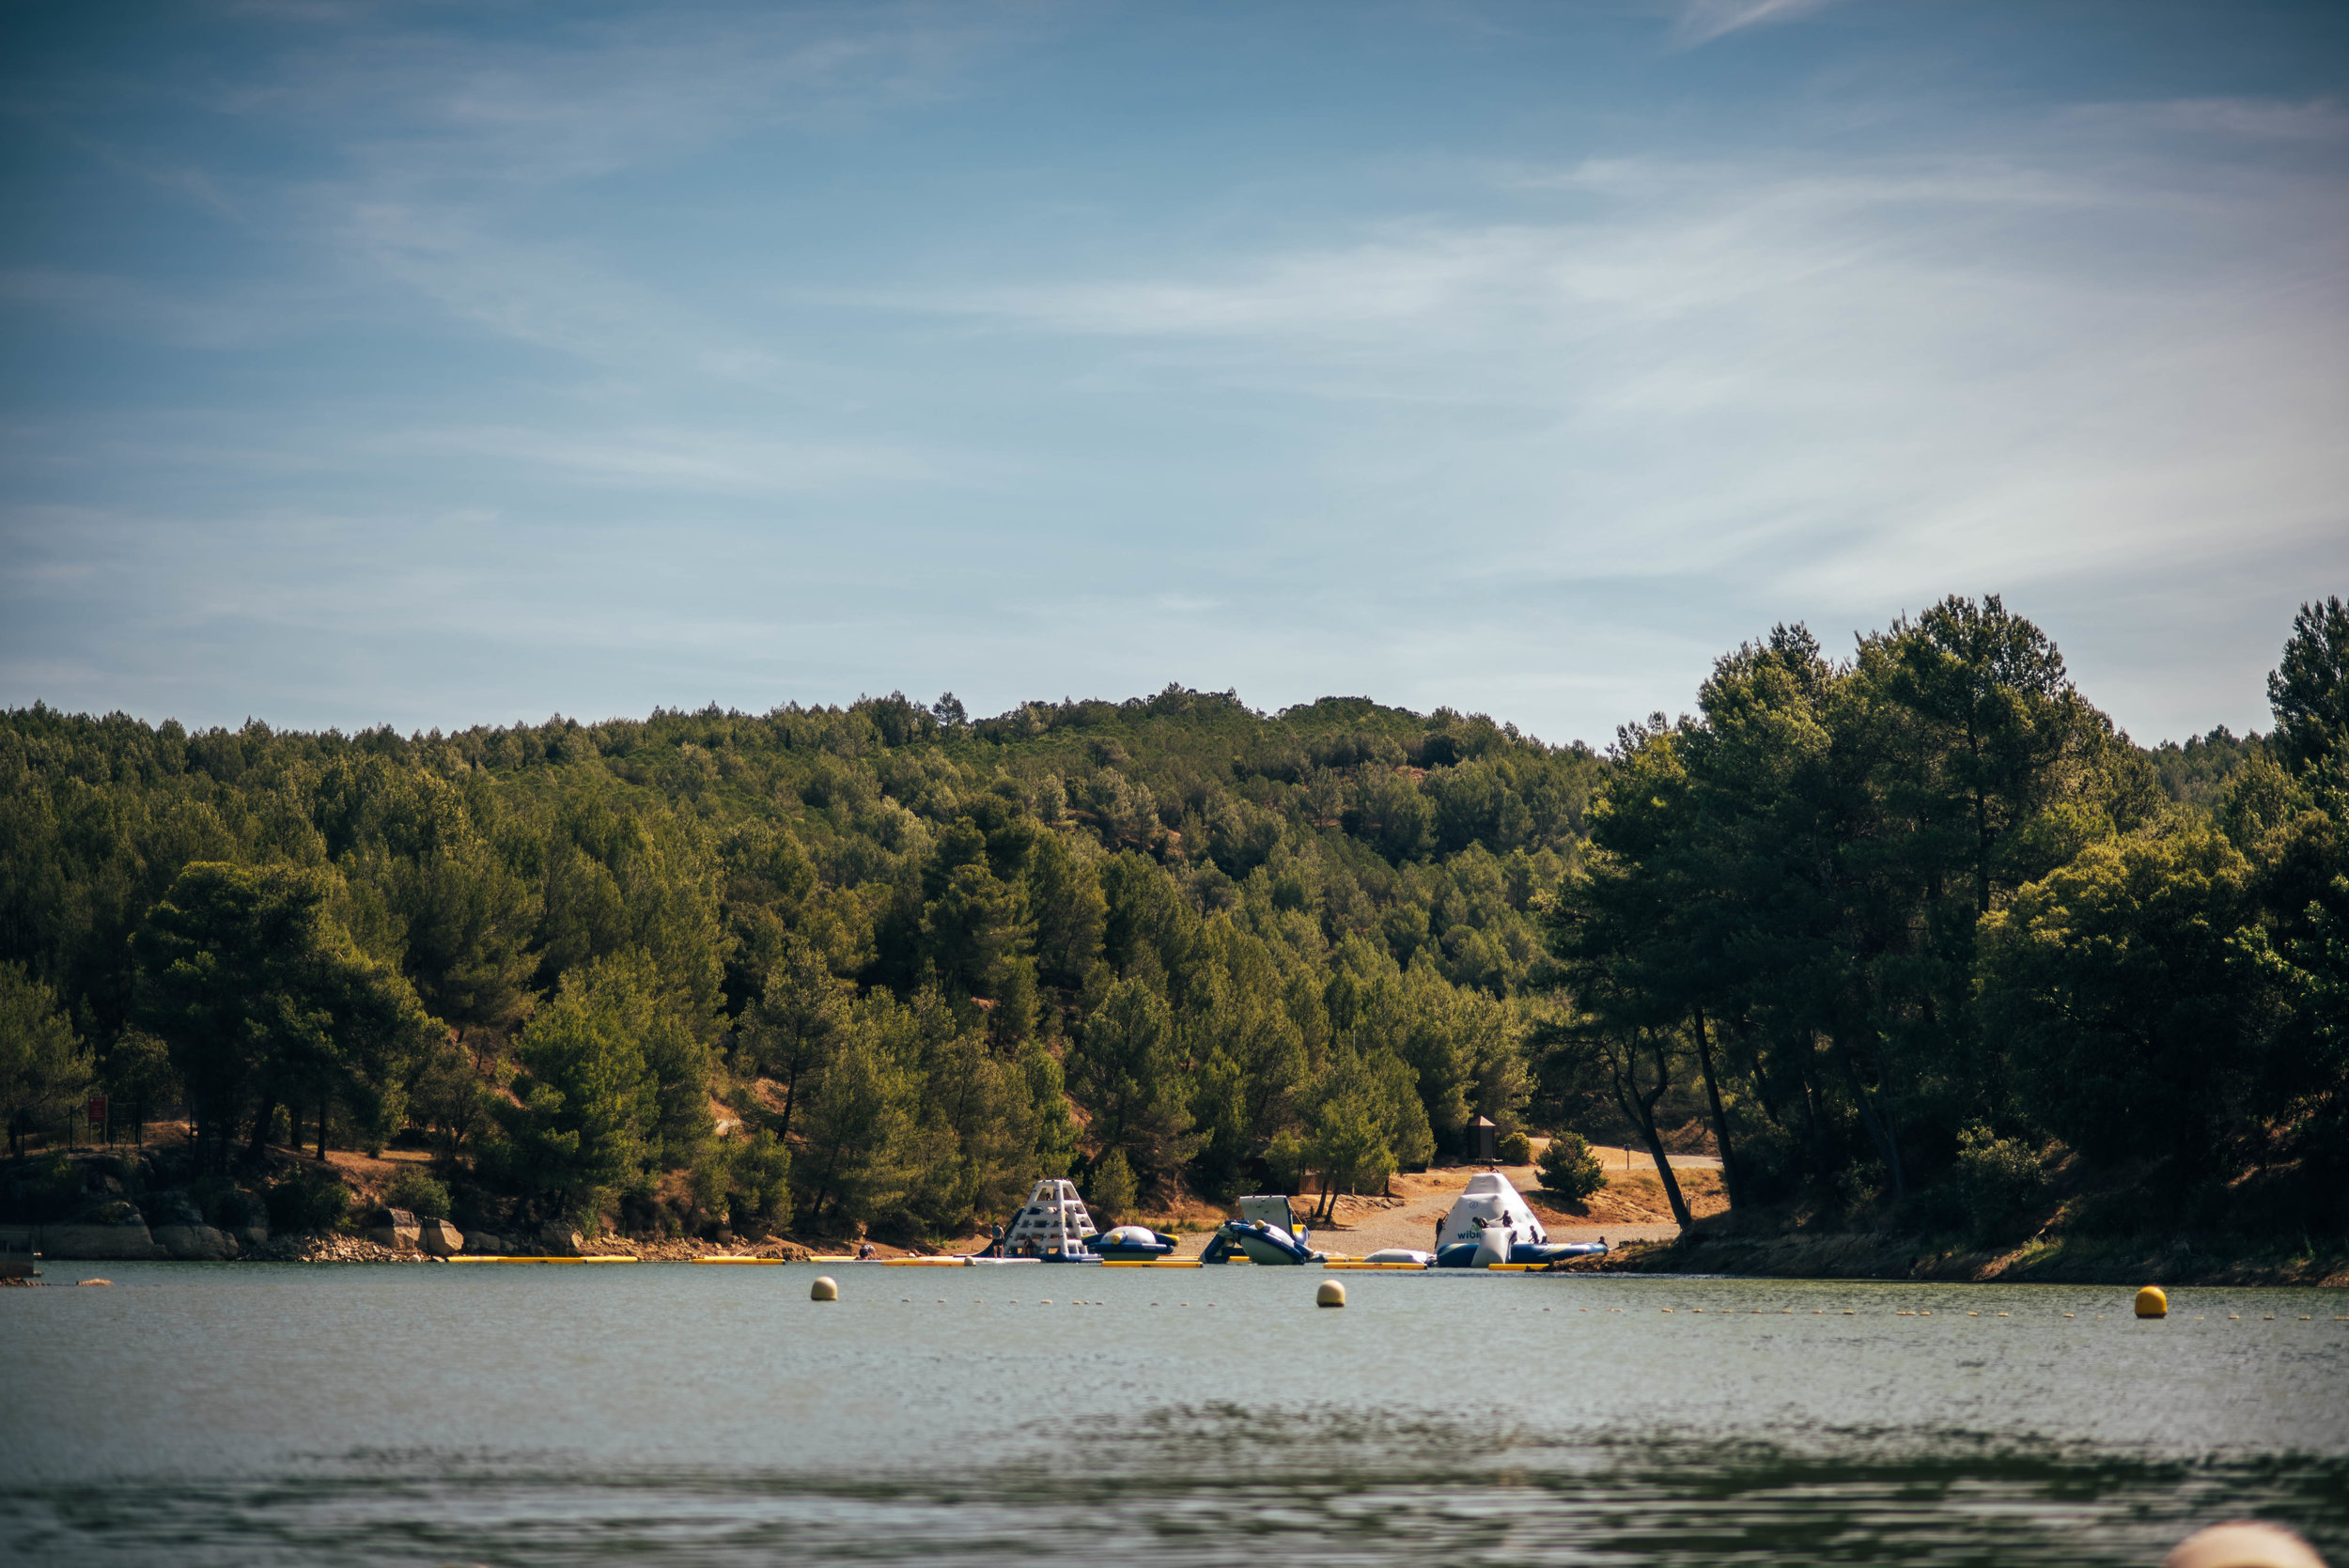 Lake in France Essex UK Documentary Photographer